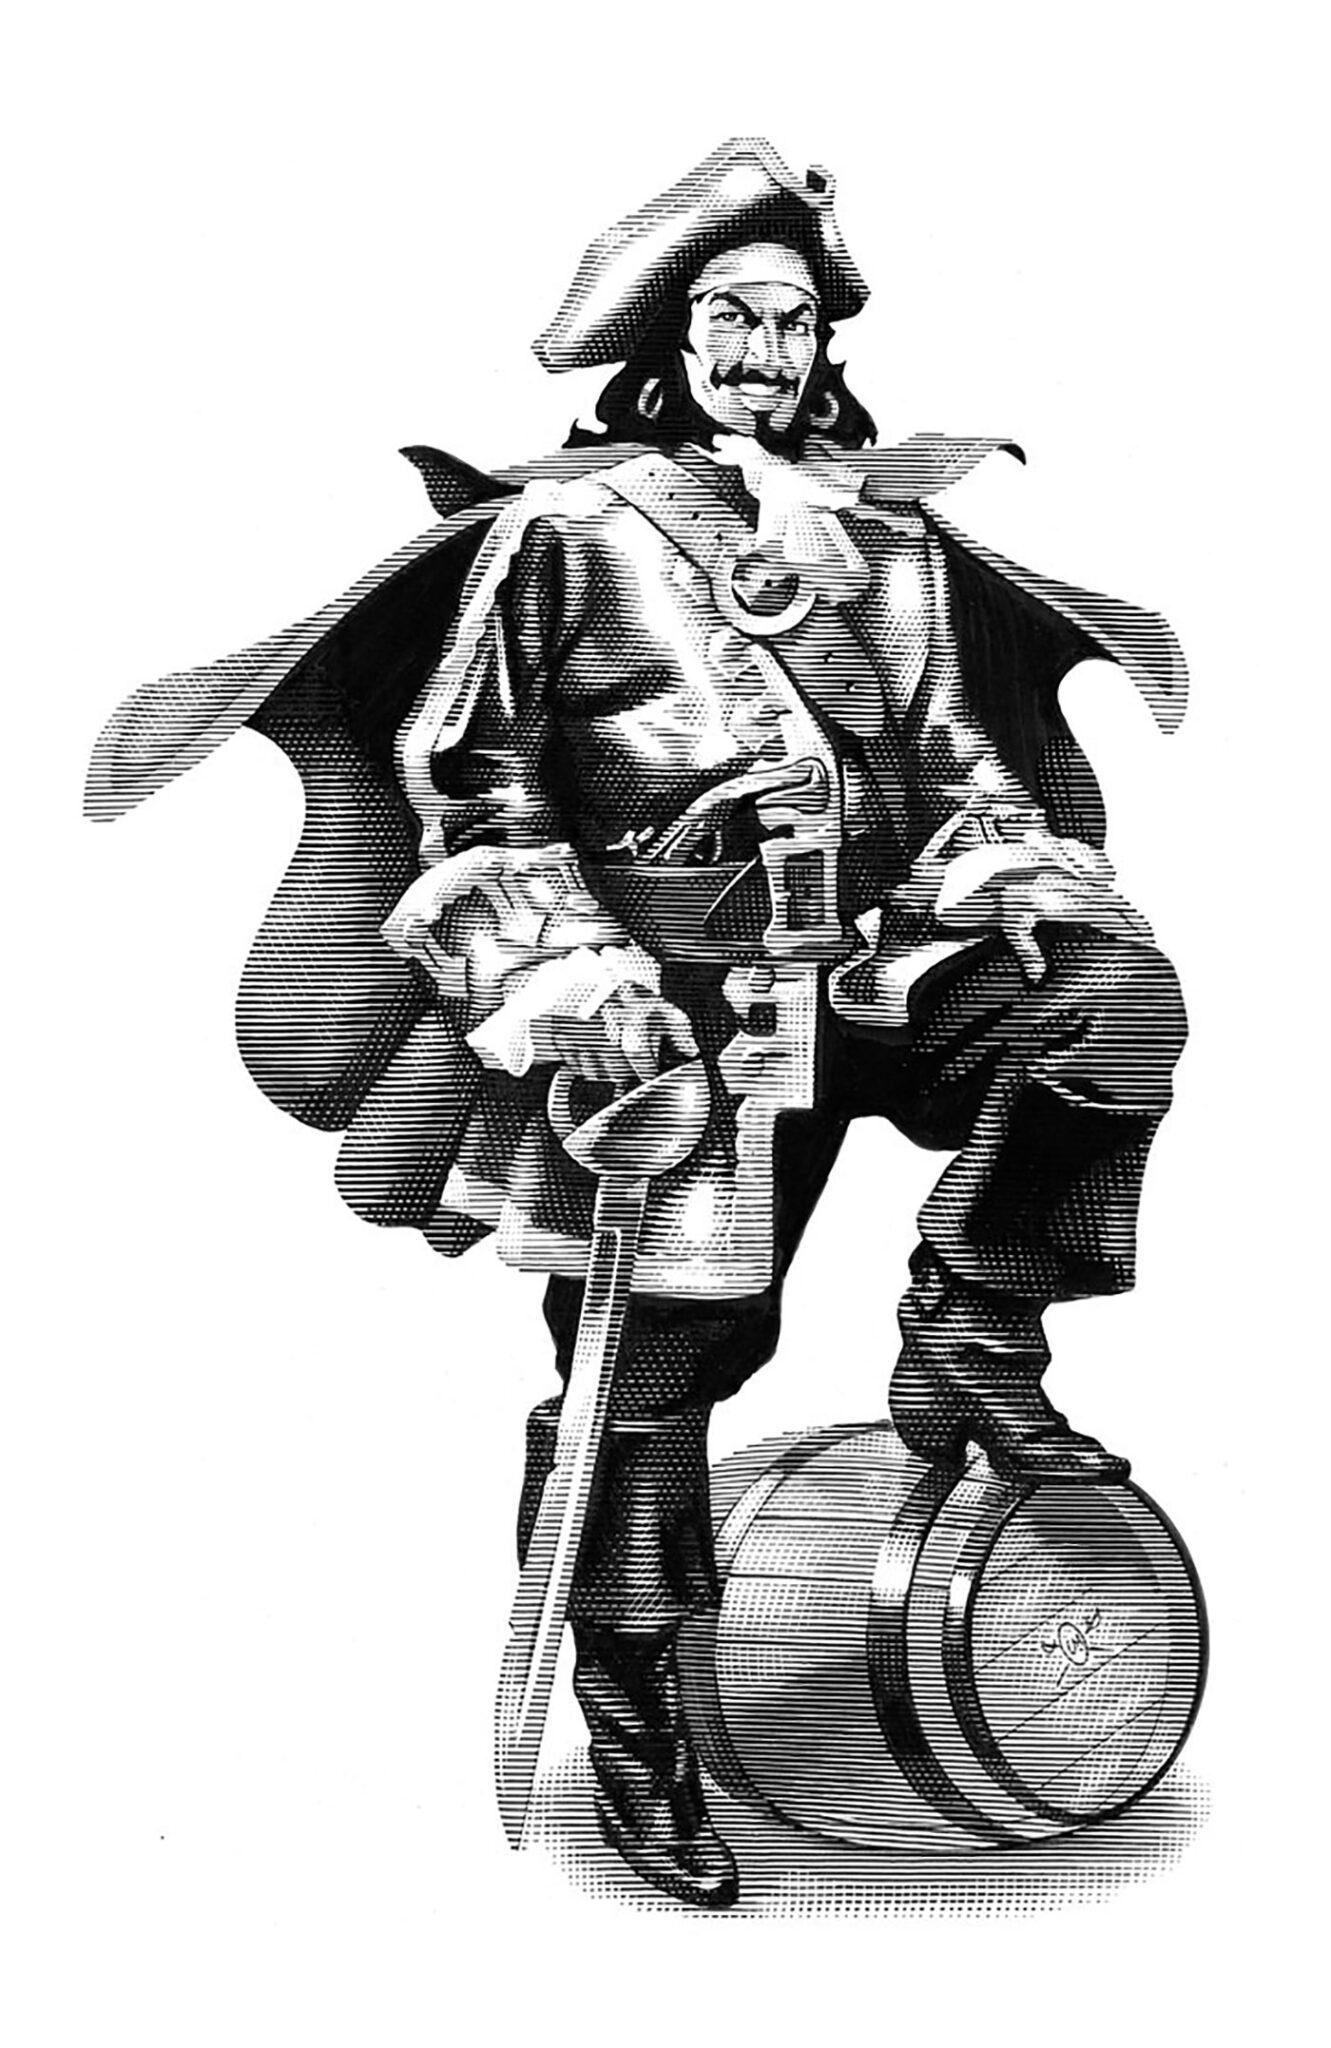 Richard Solomon - Mark-Summers-499-Captain-Morgan